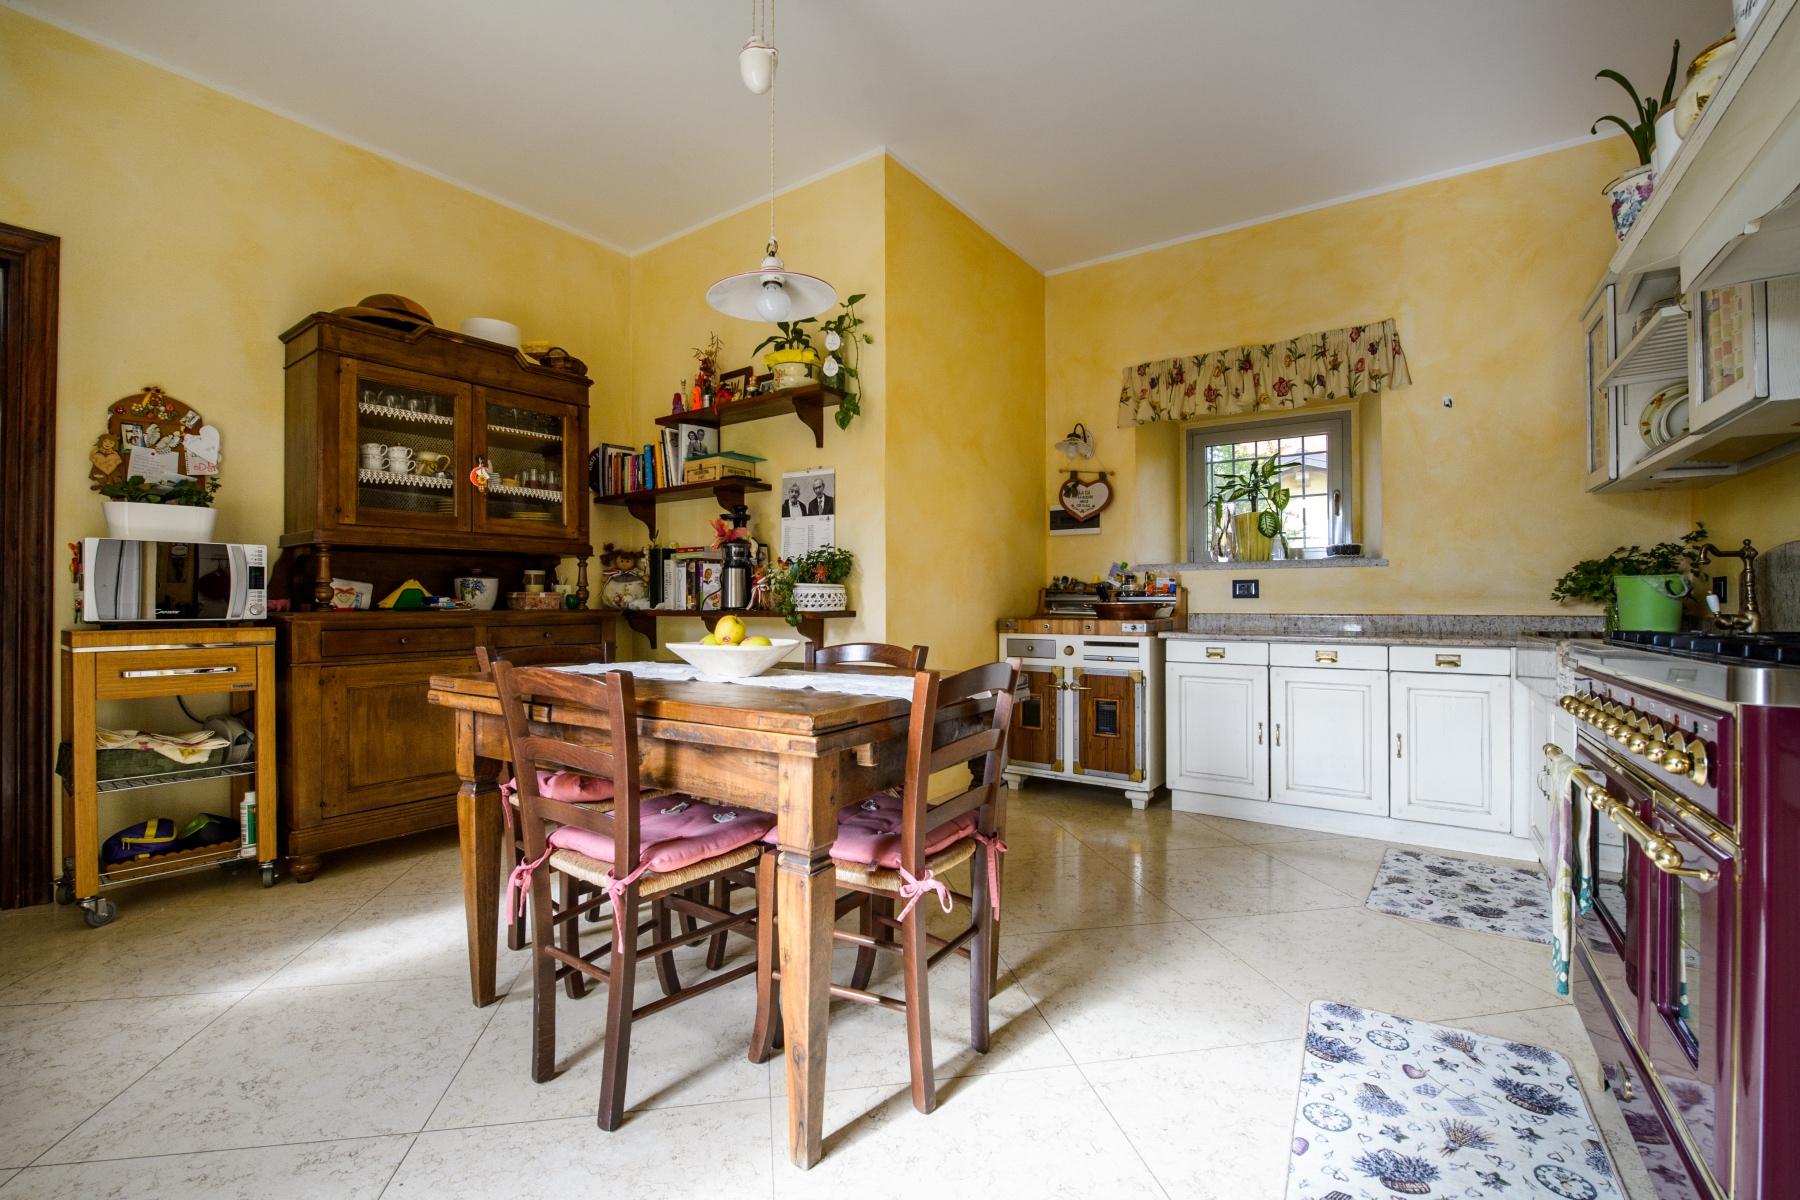 Casa indipendente in Vendita a Agrate Conturbia: 5 locali, 400 mq - Foto 7